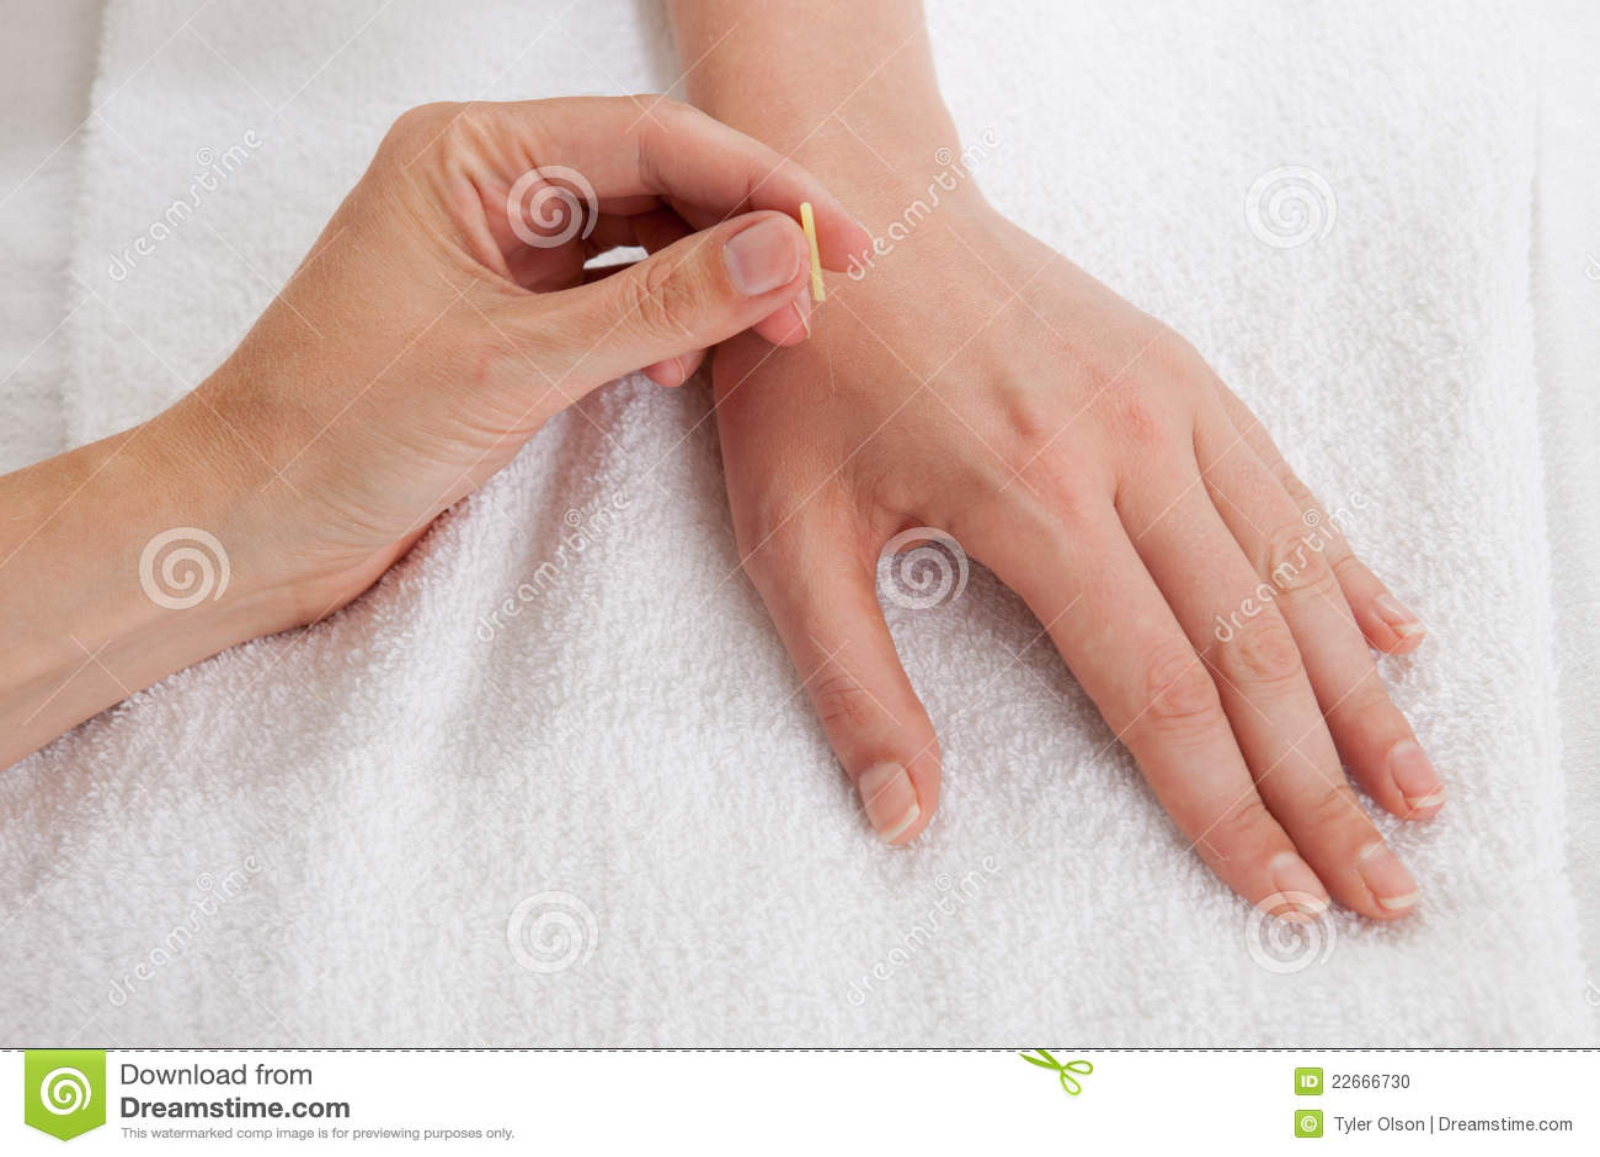 behandeling voetschimmel